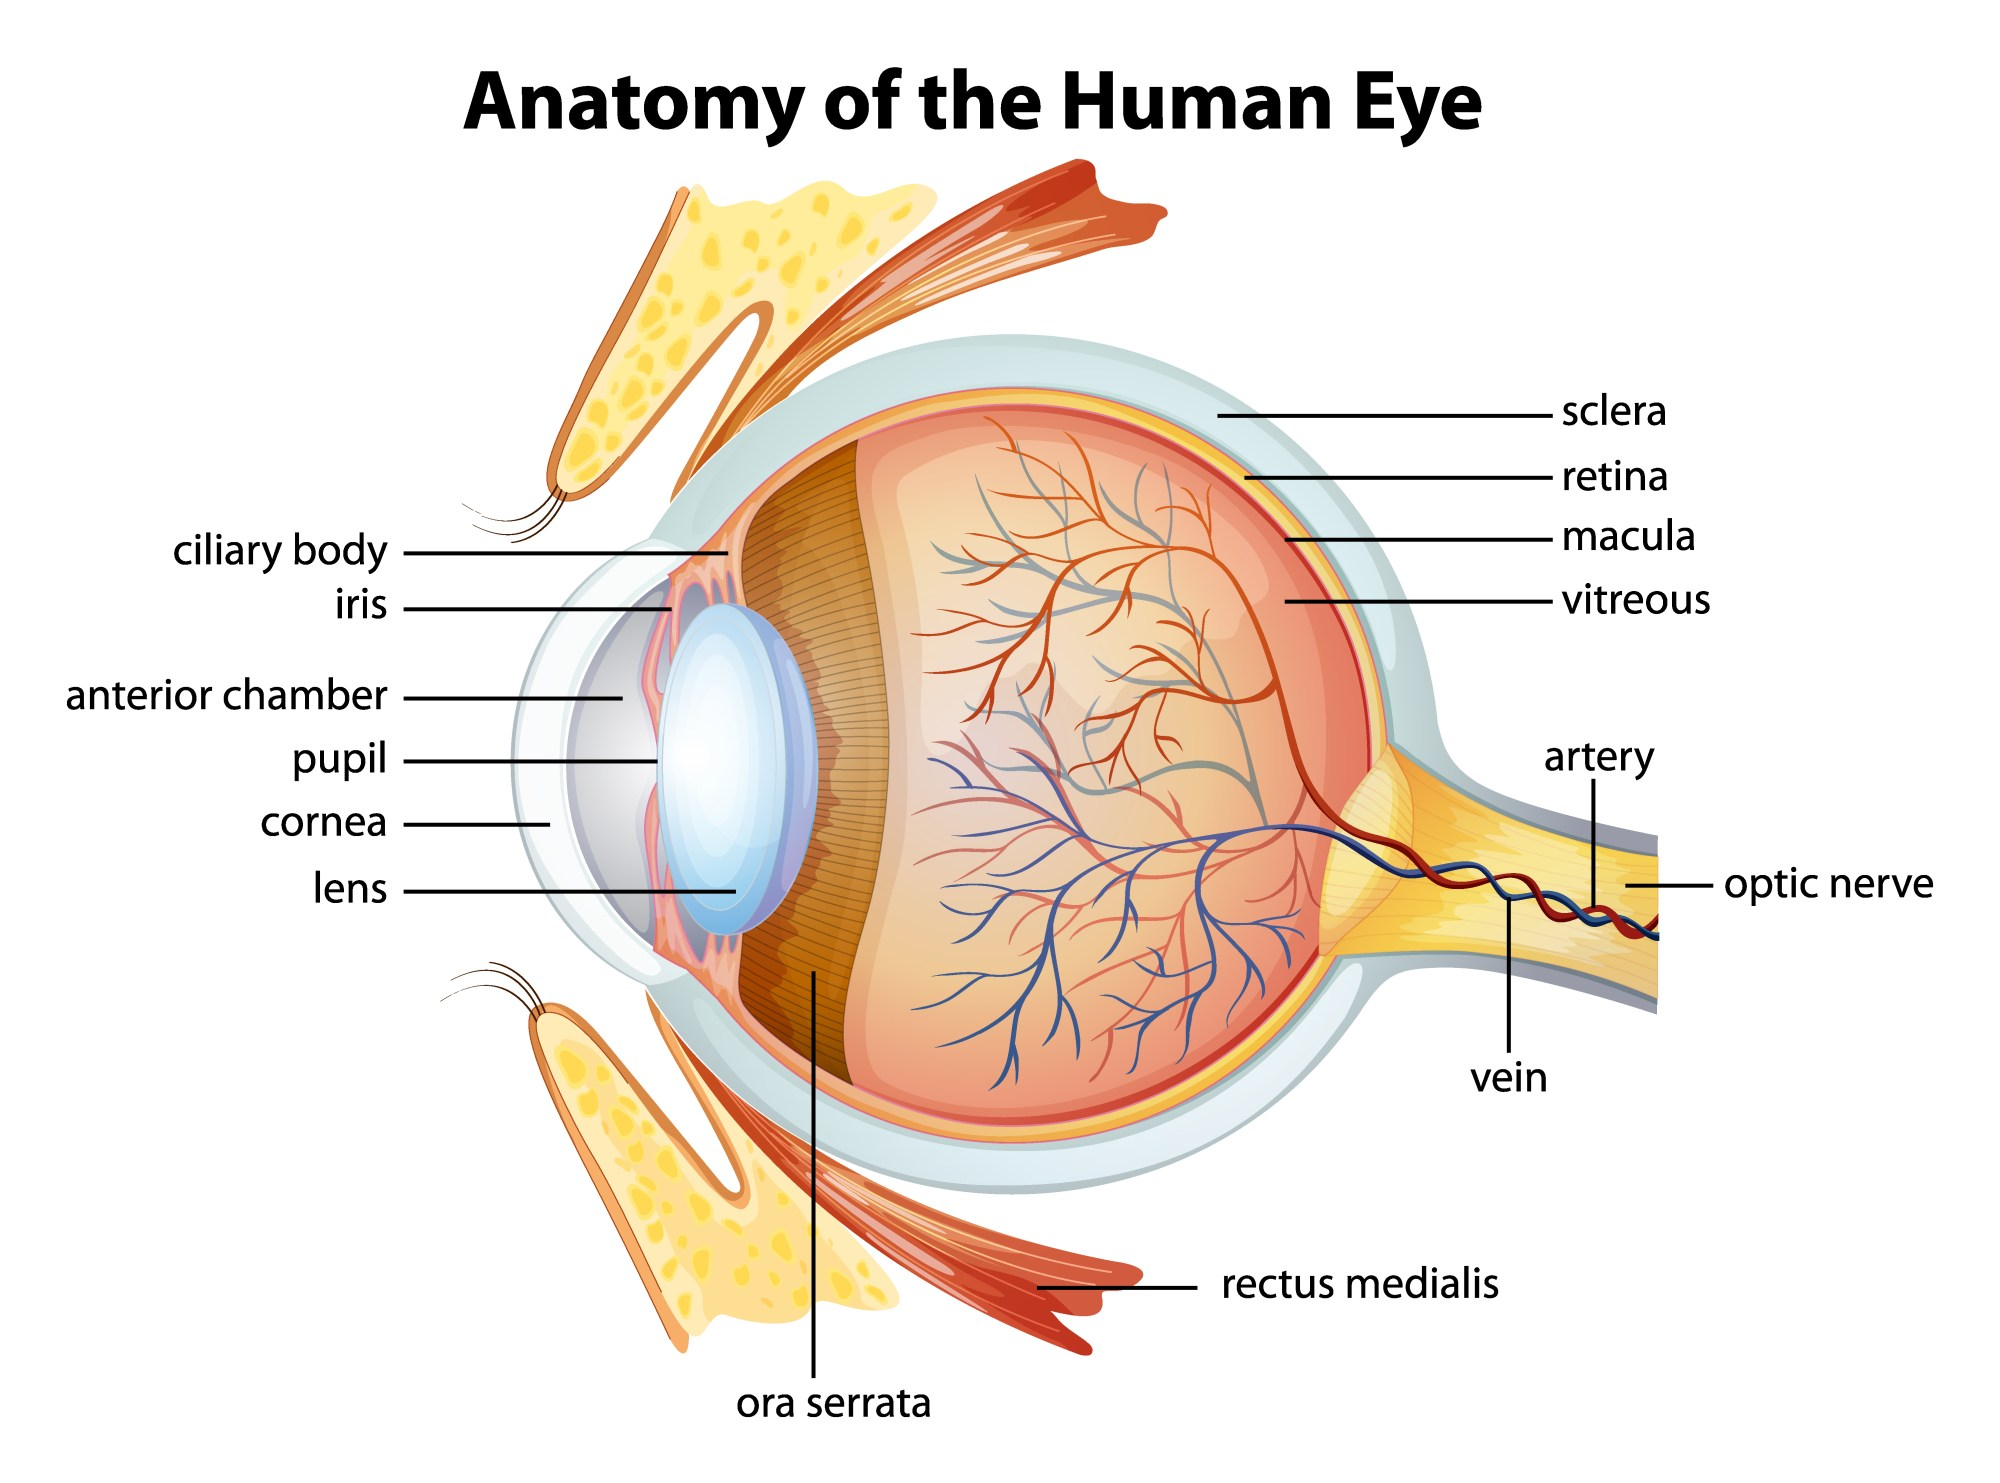 hight resolution of human eye anatomy